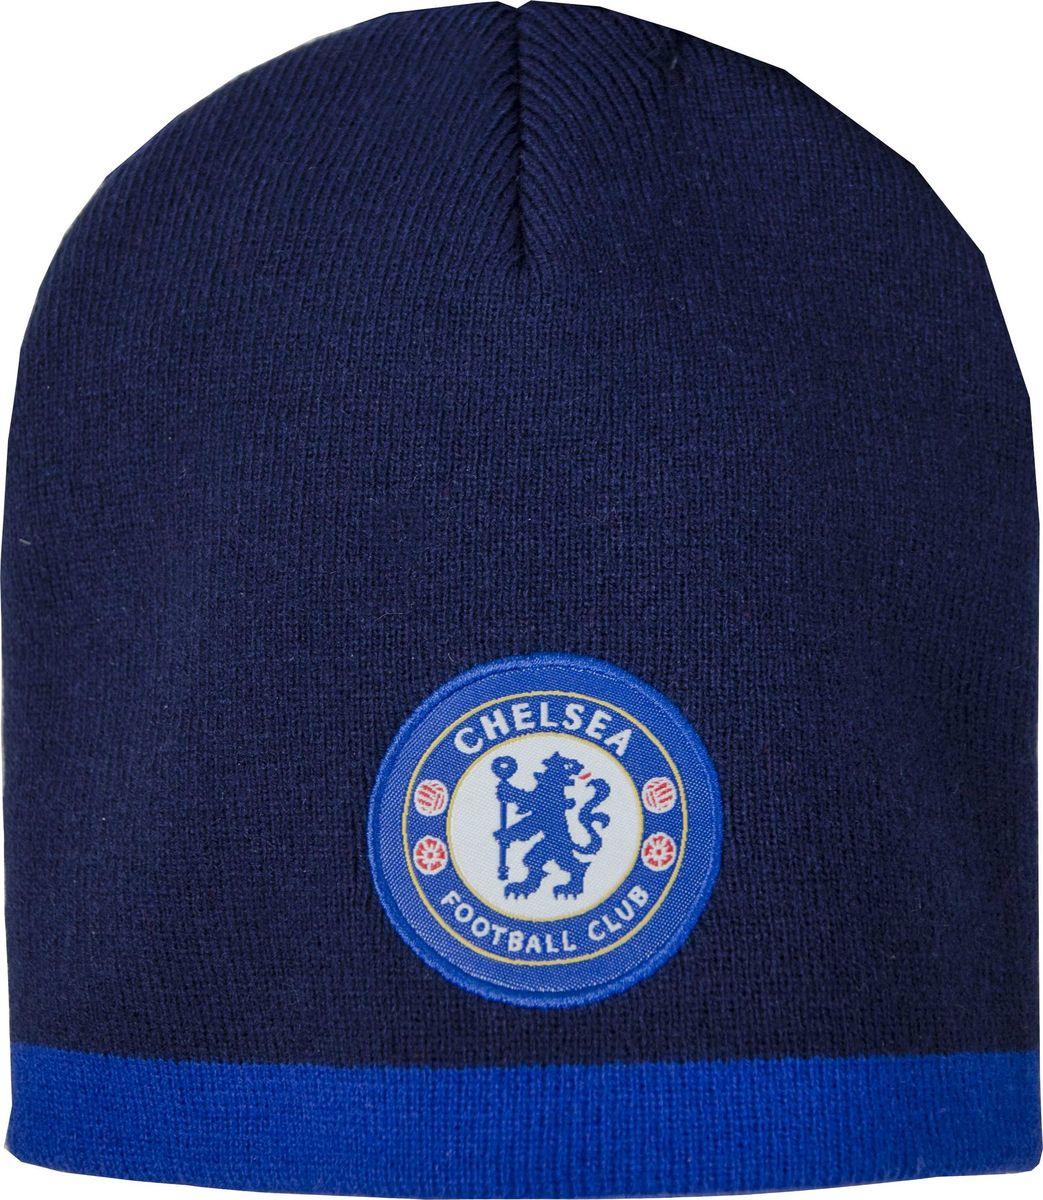 Шапка мужская Atributika & Club Chelsea, цвет: синий. 08011. Размер 55/58